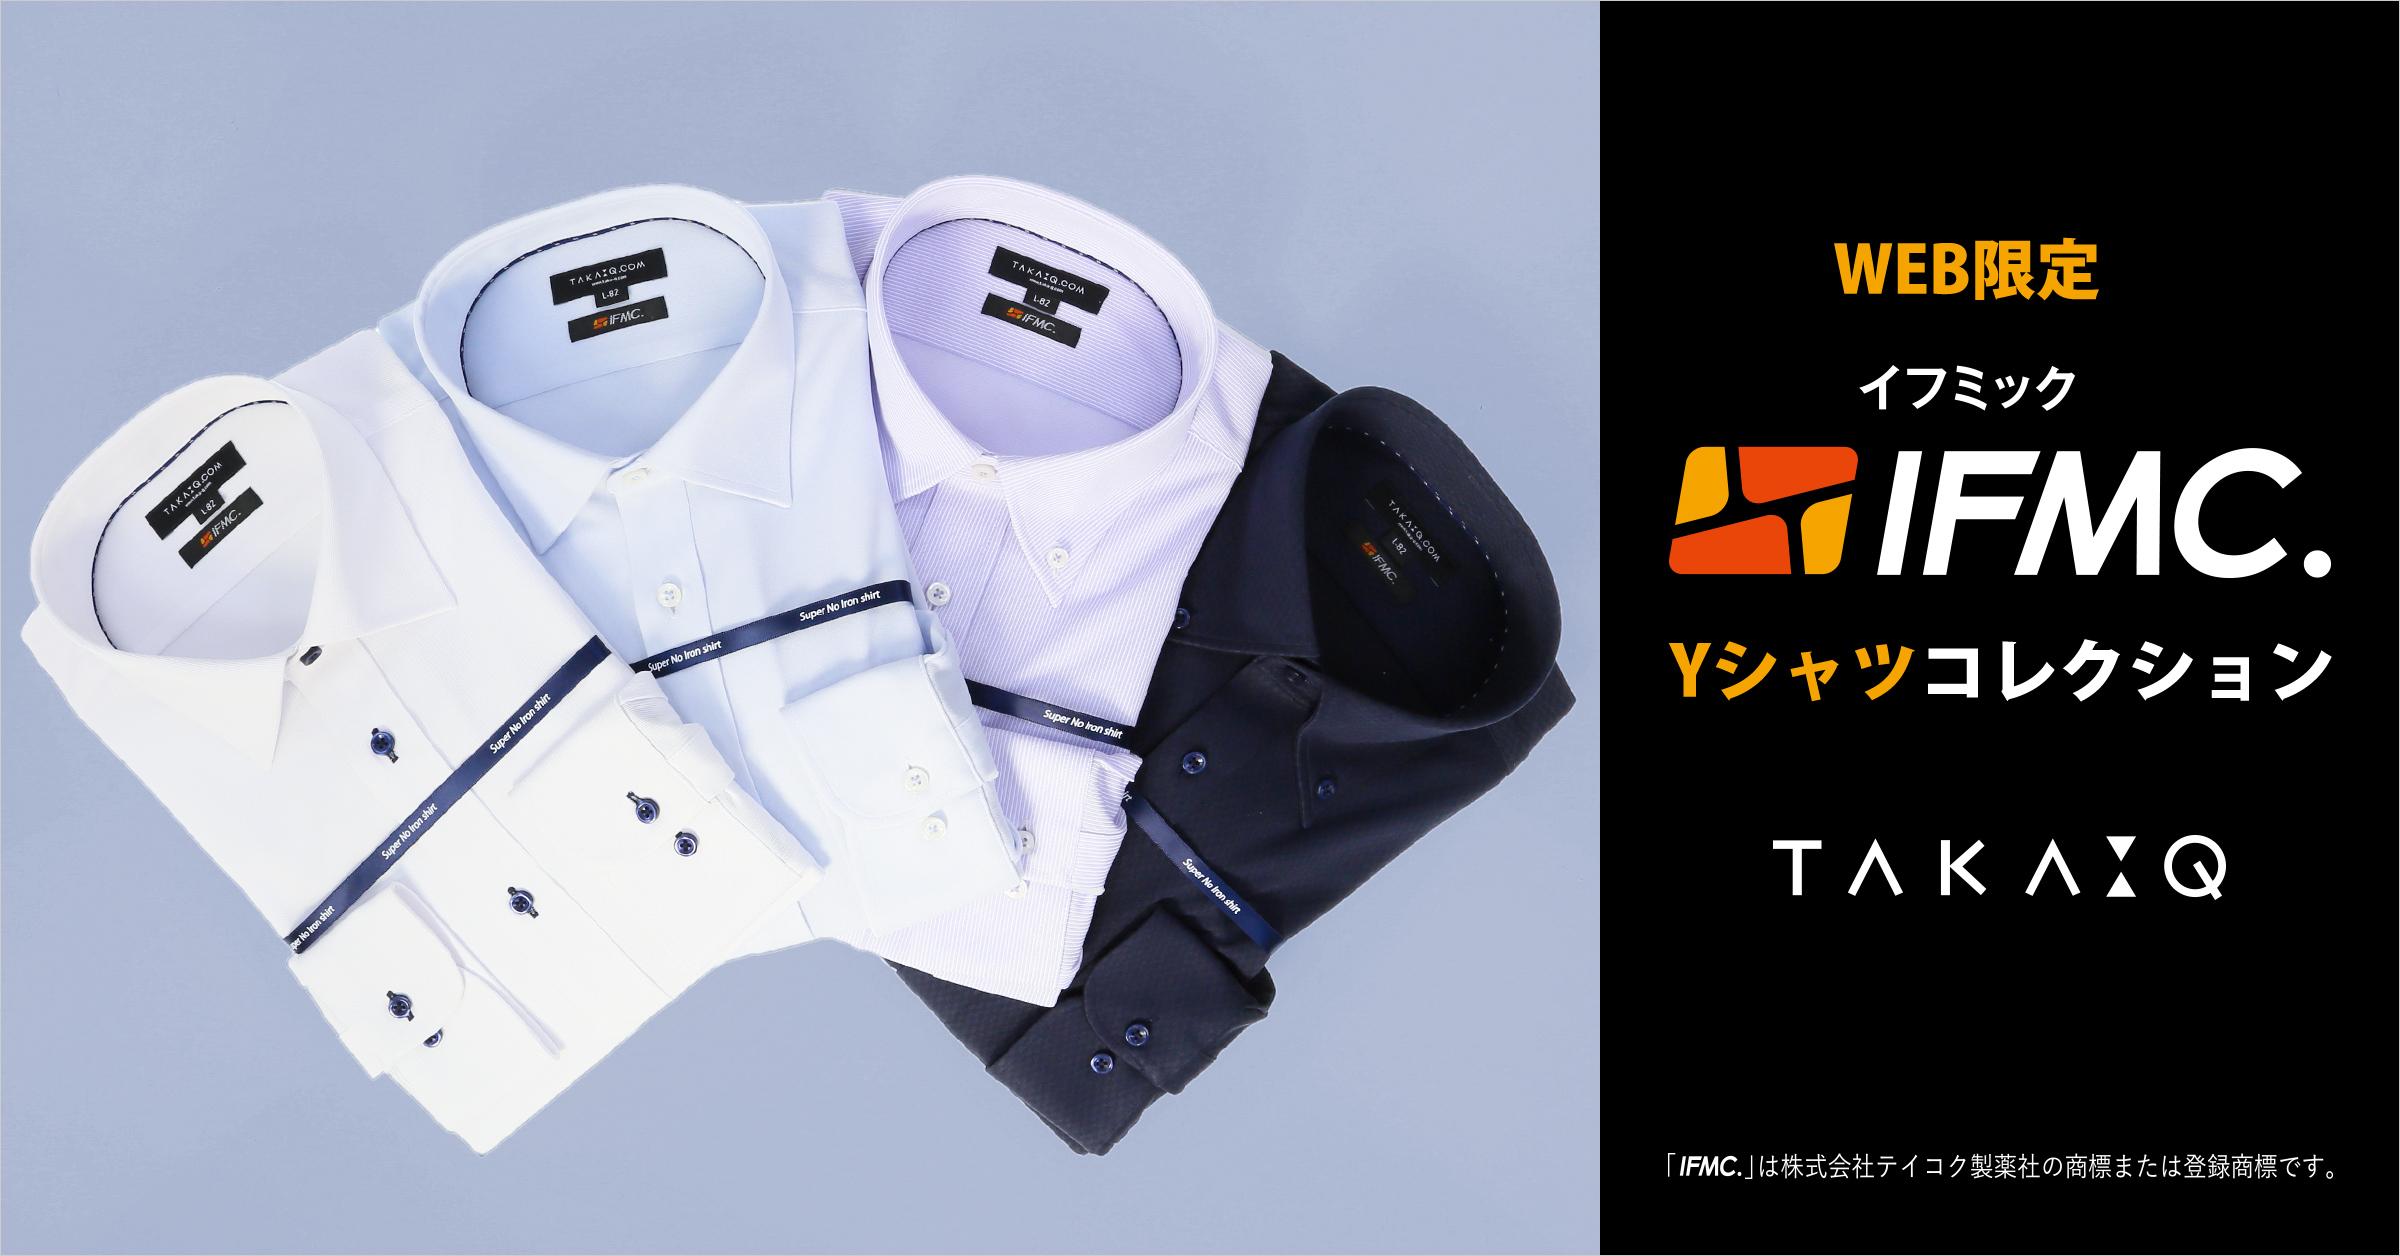 IFMC Yシャツコレクション